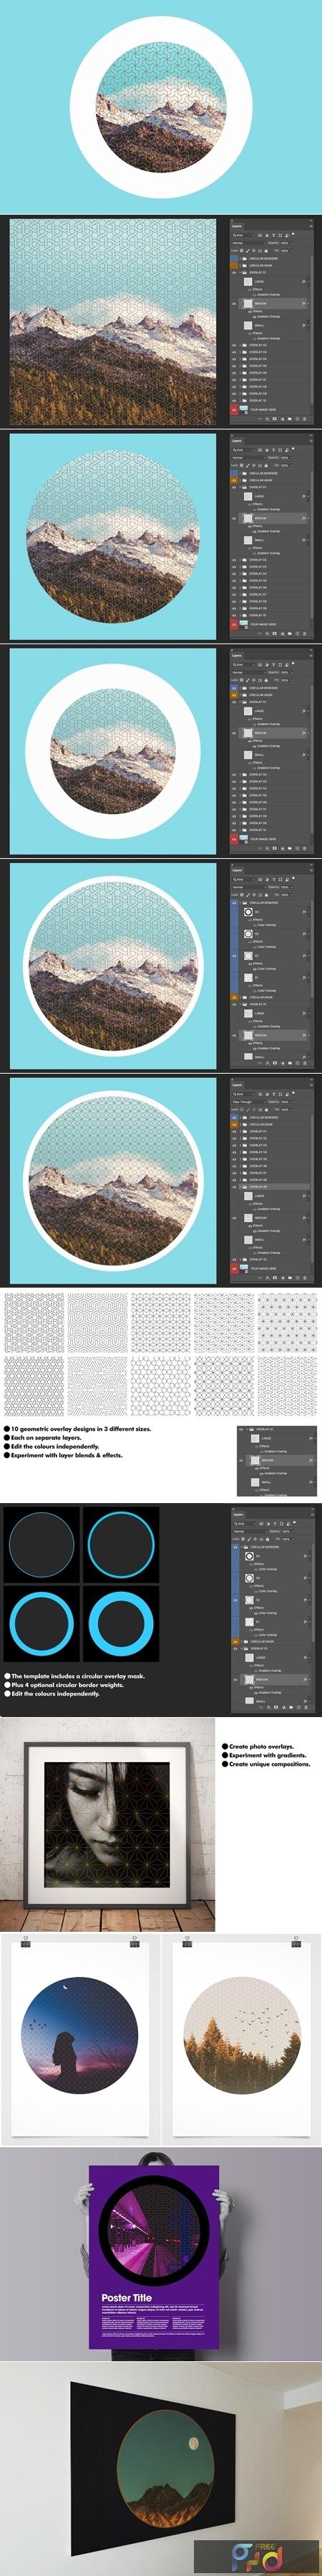 Geometric Overlay Effects 4359954 1